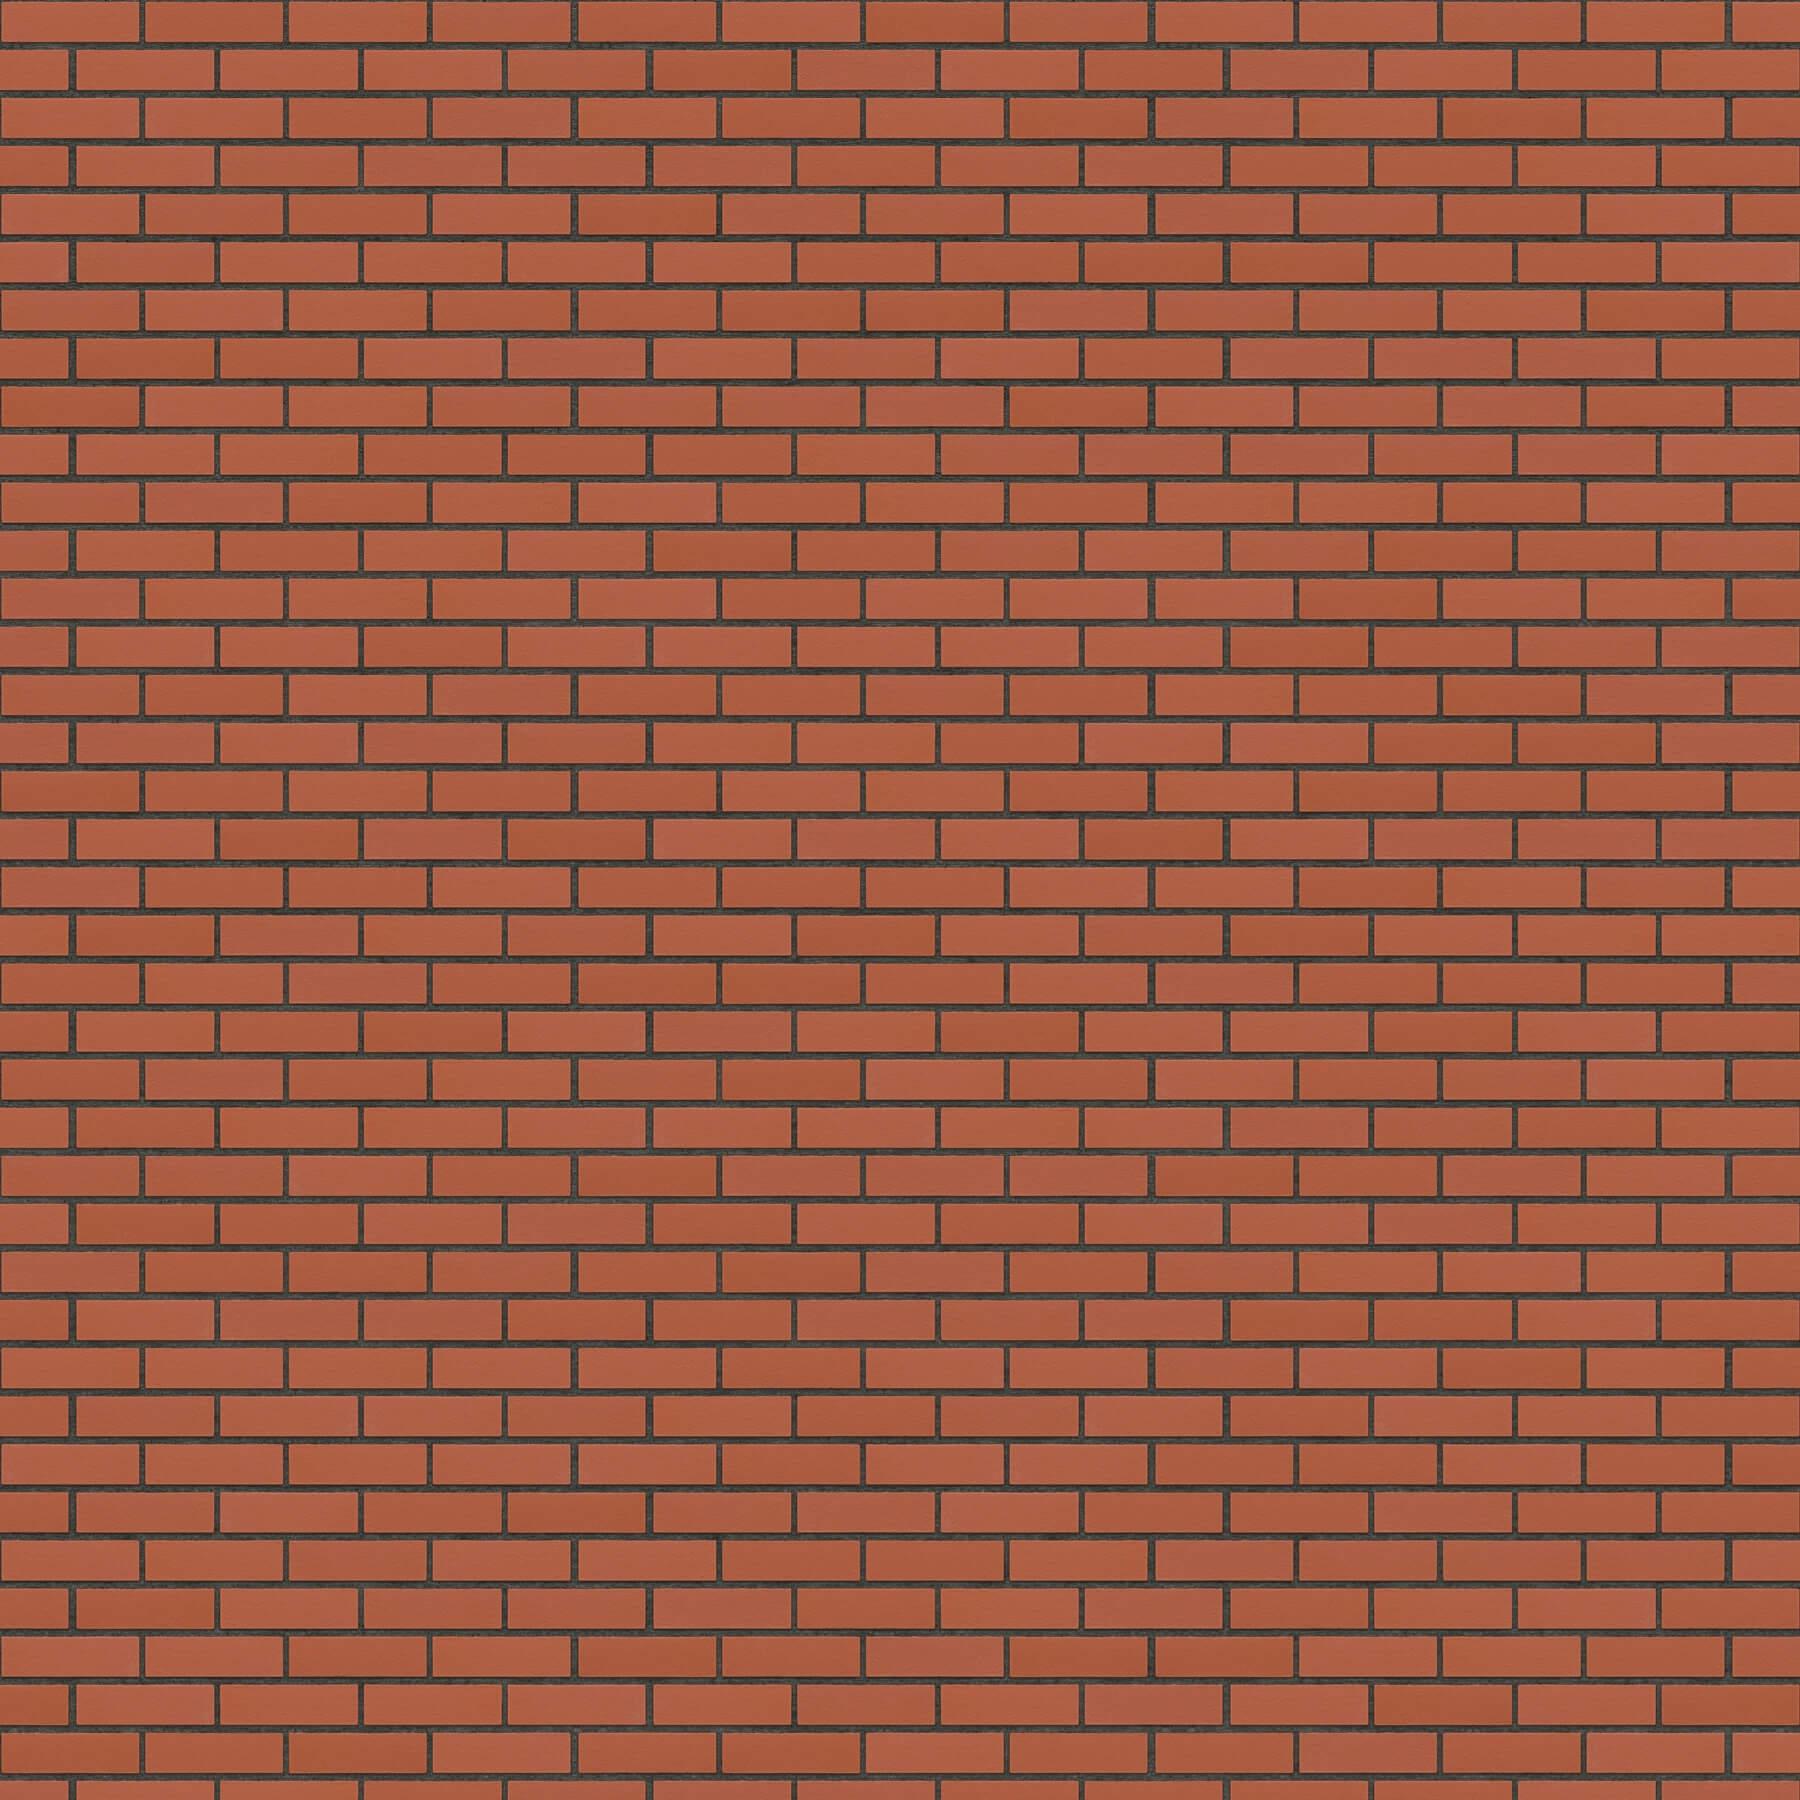 Puna-cigla-FeldHaus-Klinker-brick-house-nf-k-400-Antracit Fuga